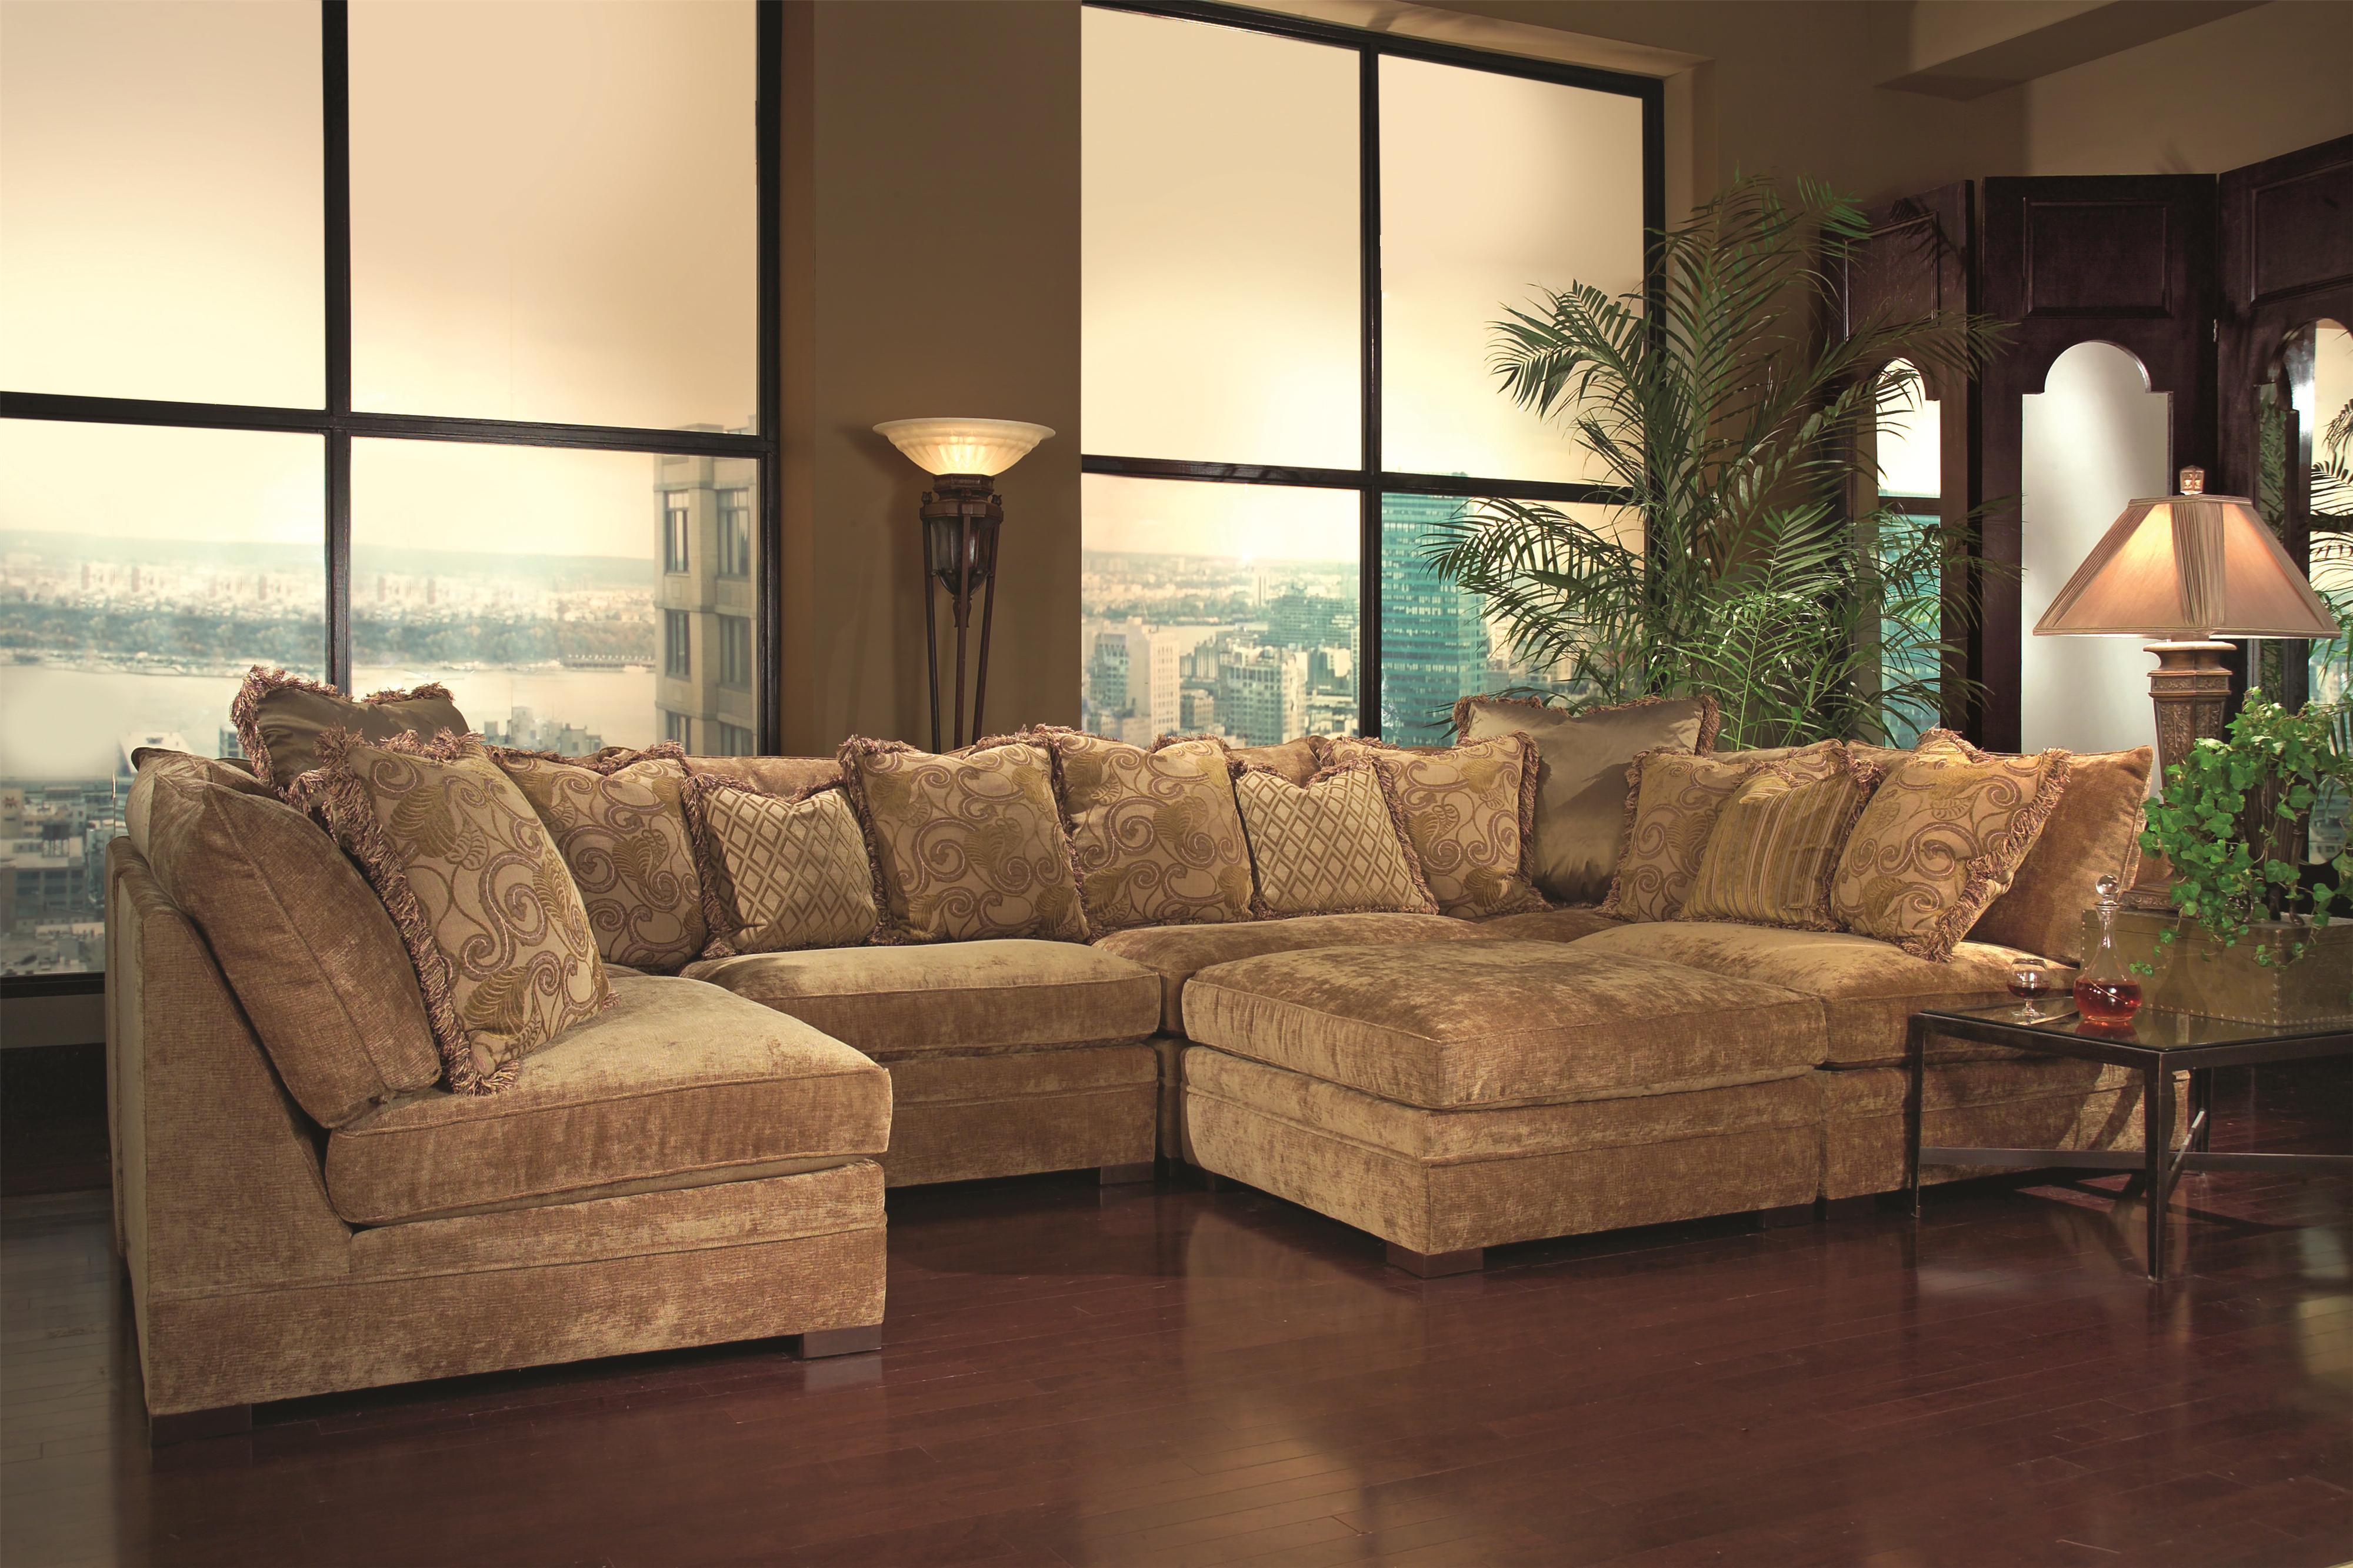 7100 Sectional Sofa by Geoffrey Alexander at Sprintz Furniture